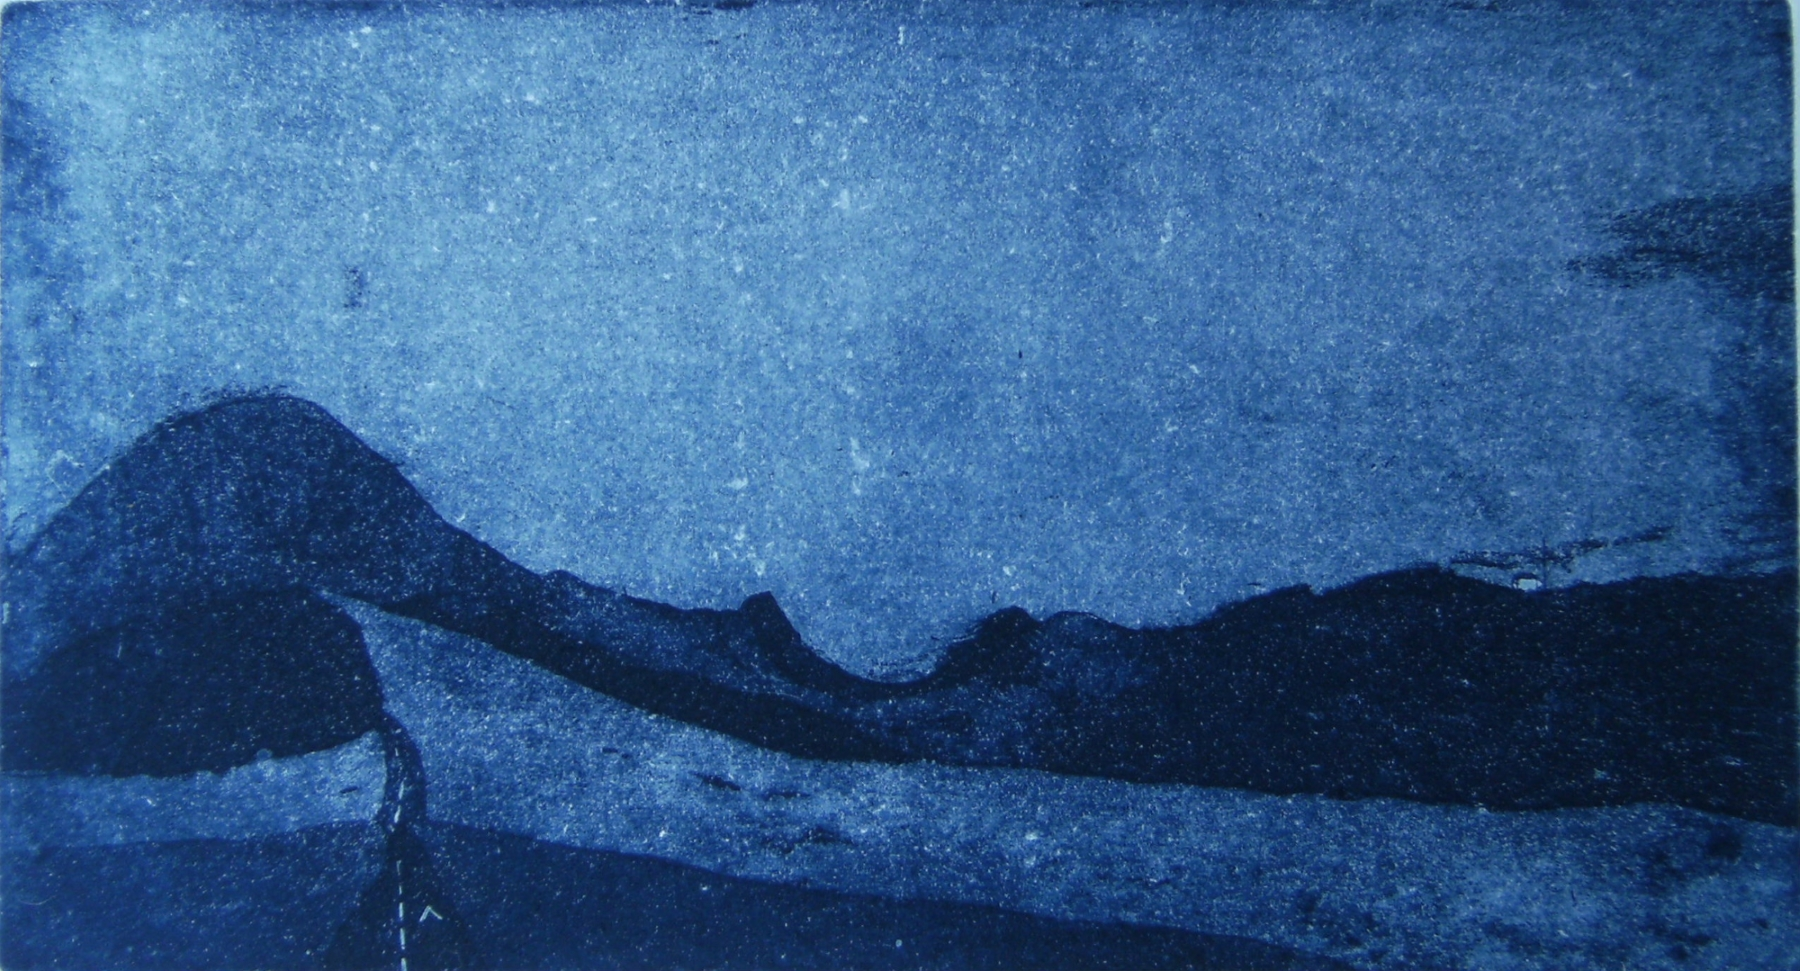 Moody blue etching by British print maker Jamie Barnes